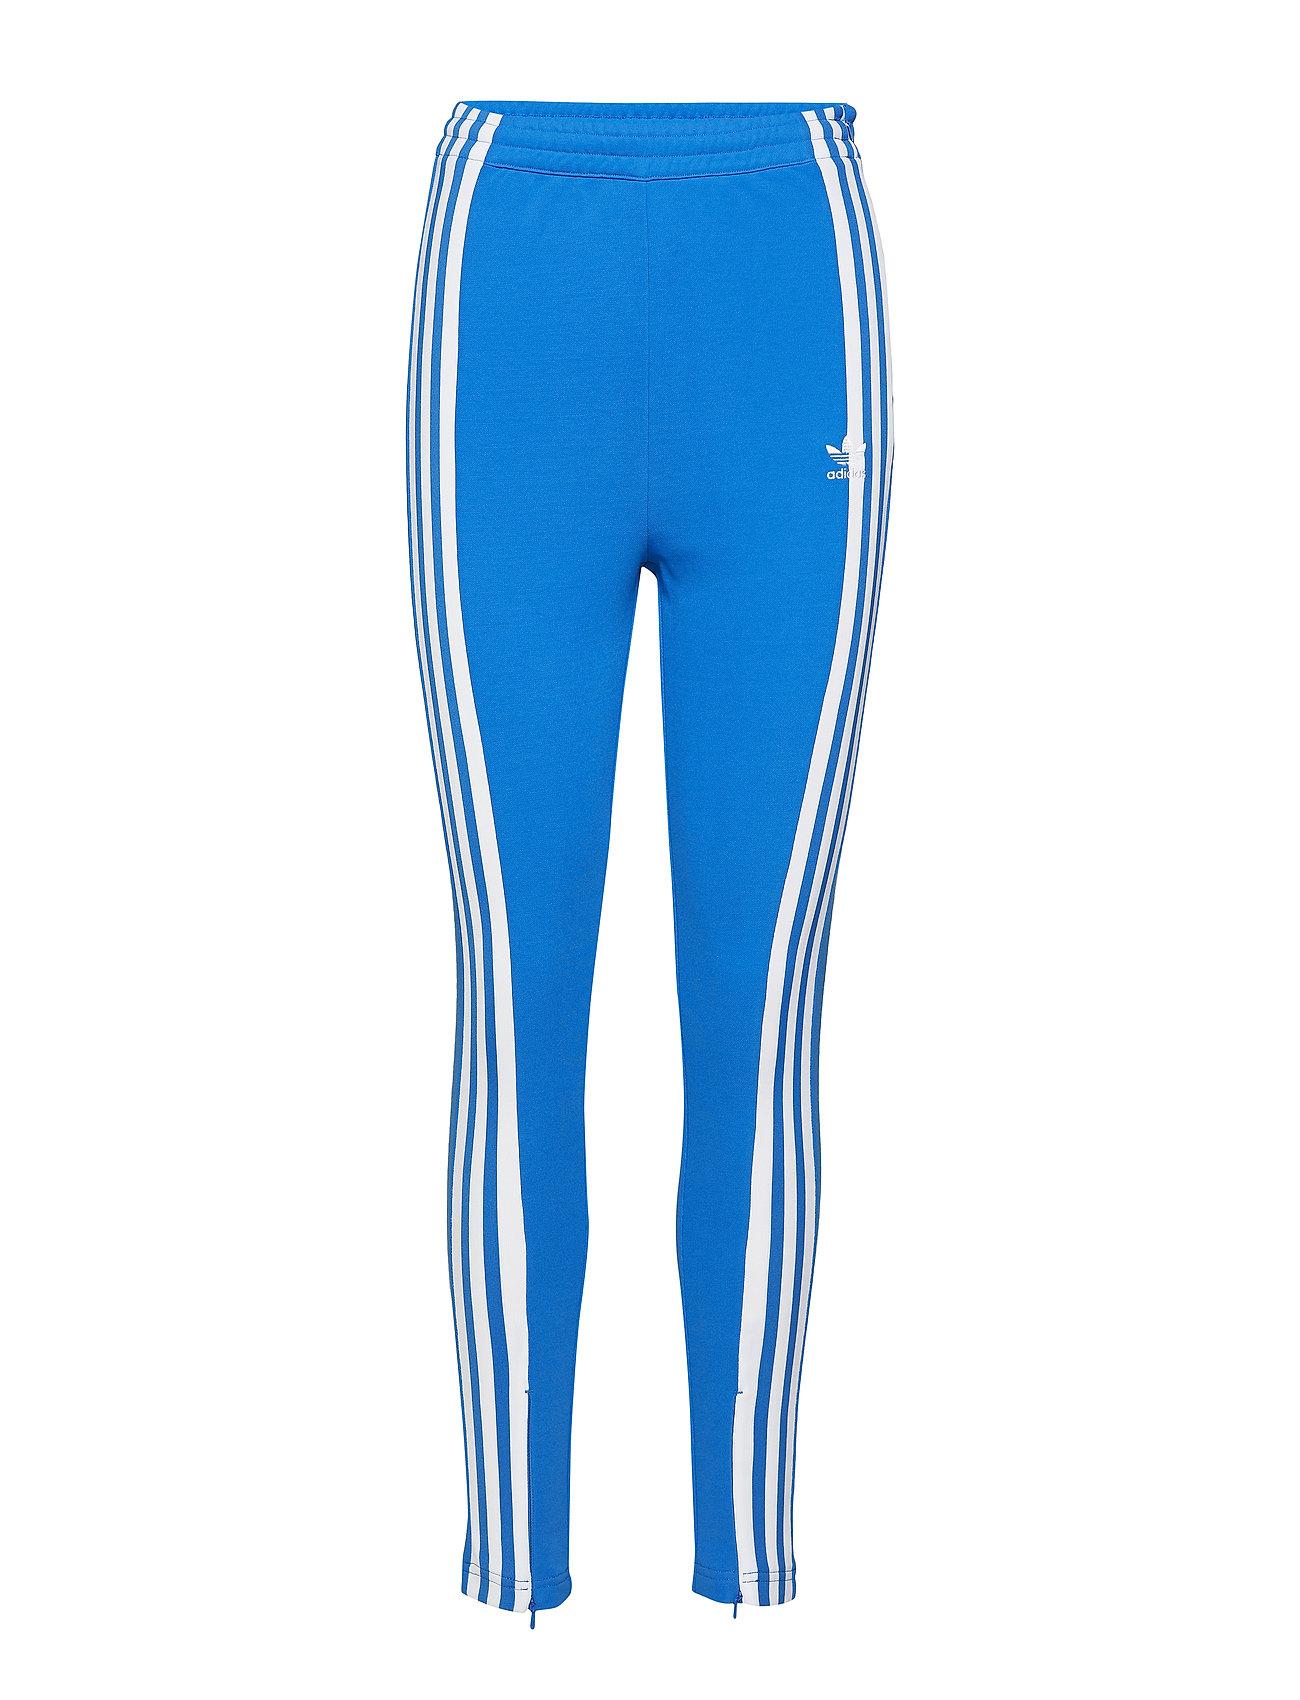 Adidas Originals TRACK PANT Sweatpants